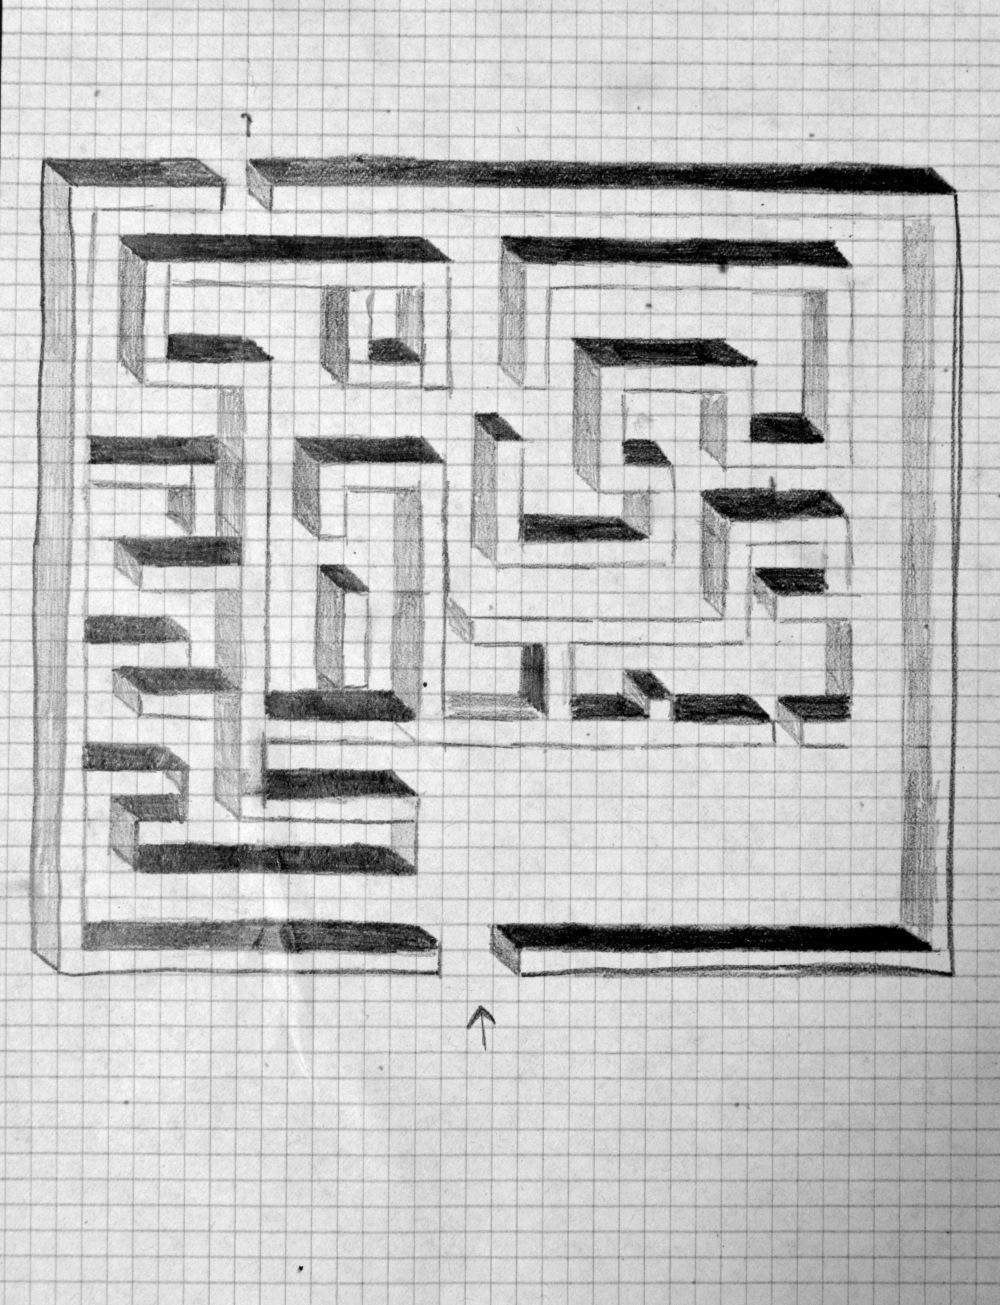 labirintus 03